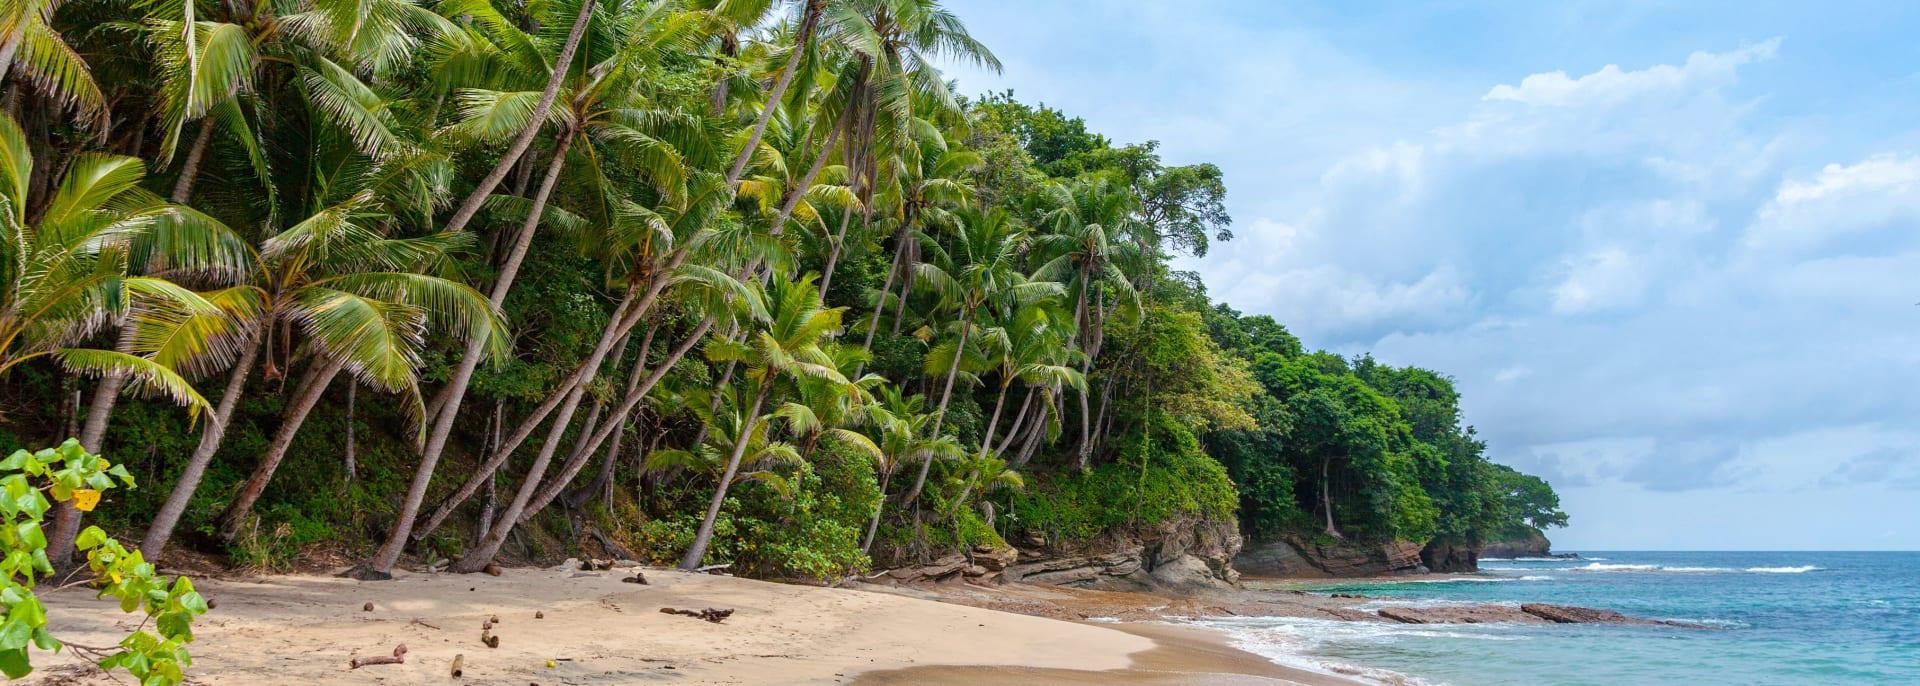 Playa Blanca, Saboga, Panama